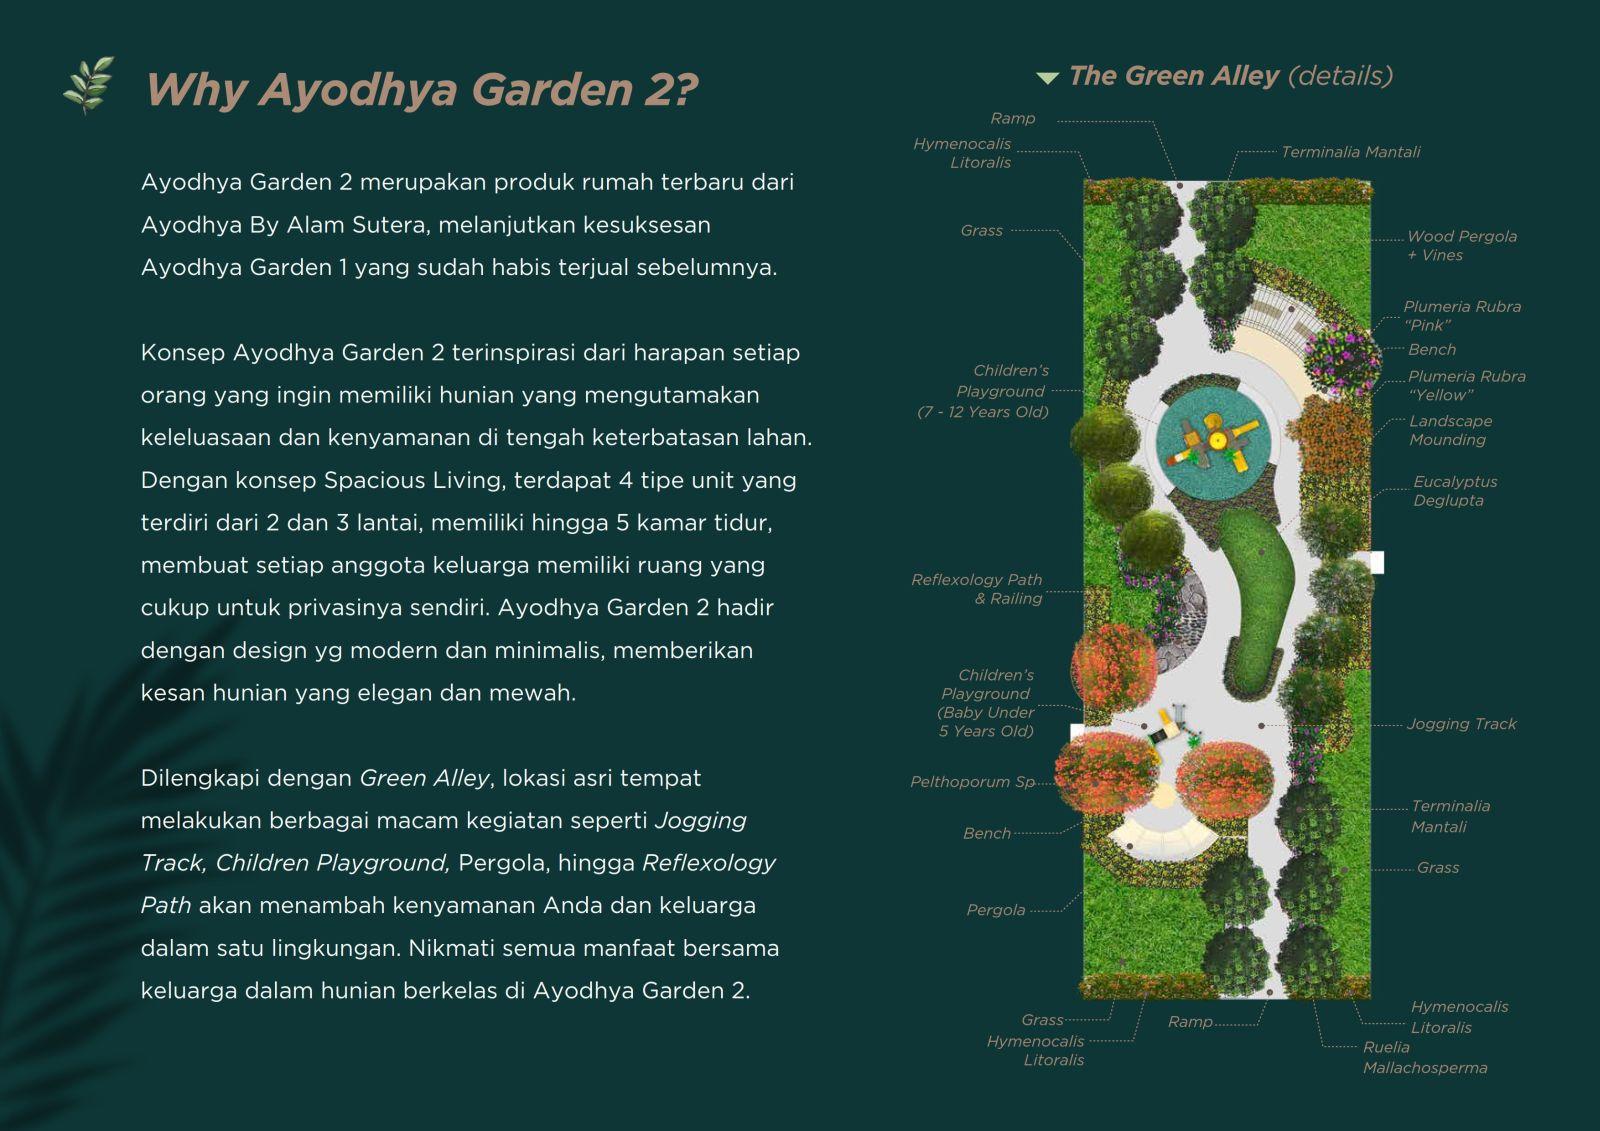 Ayodhya-Garden-2-1